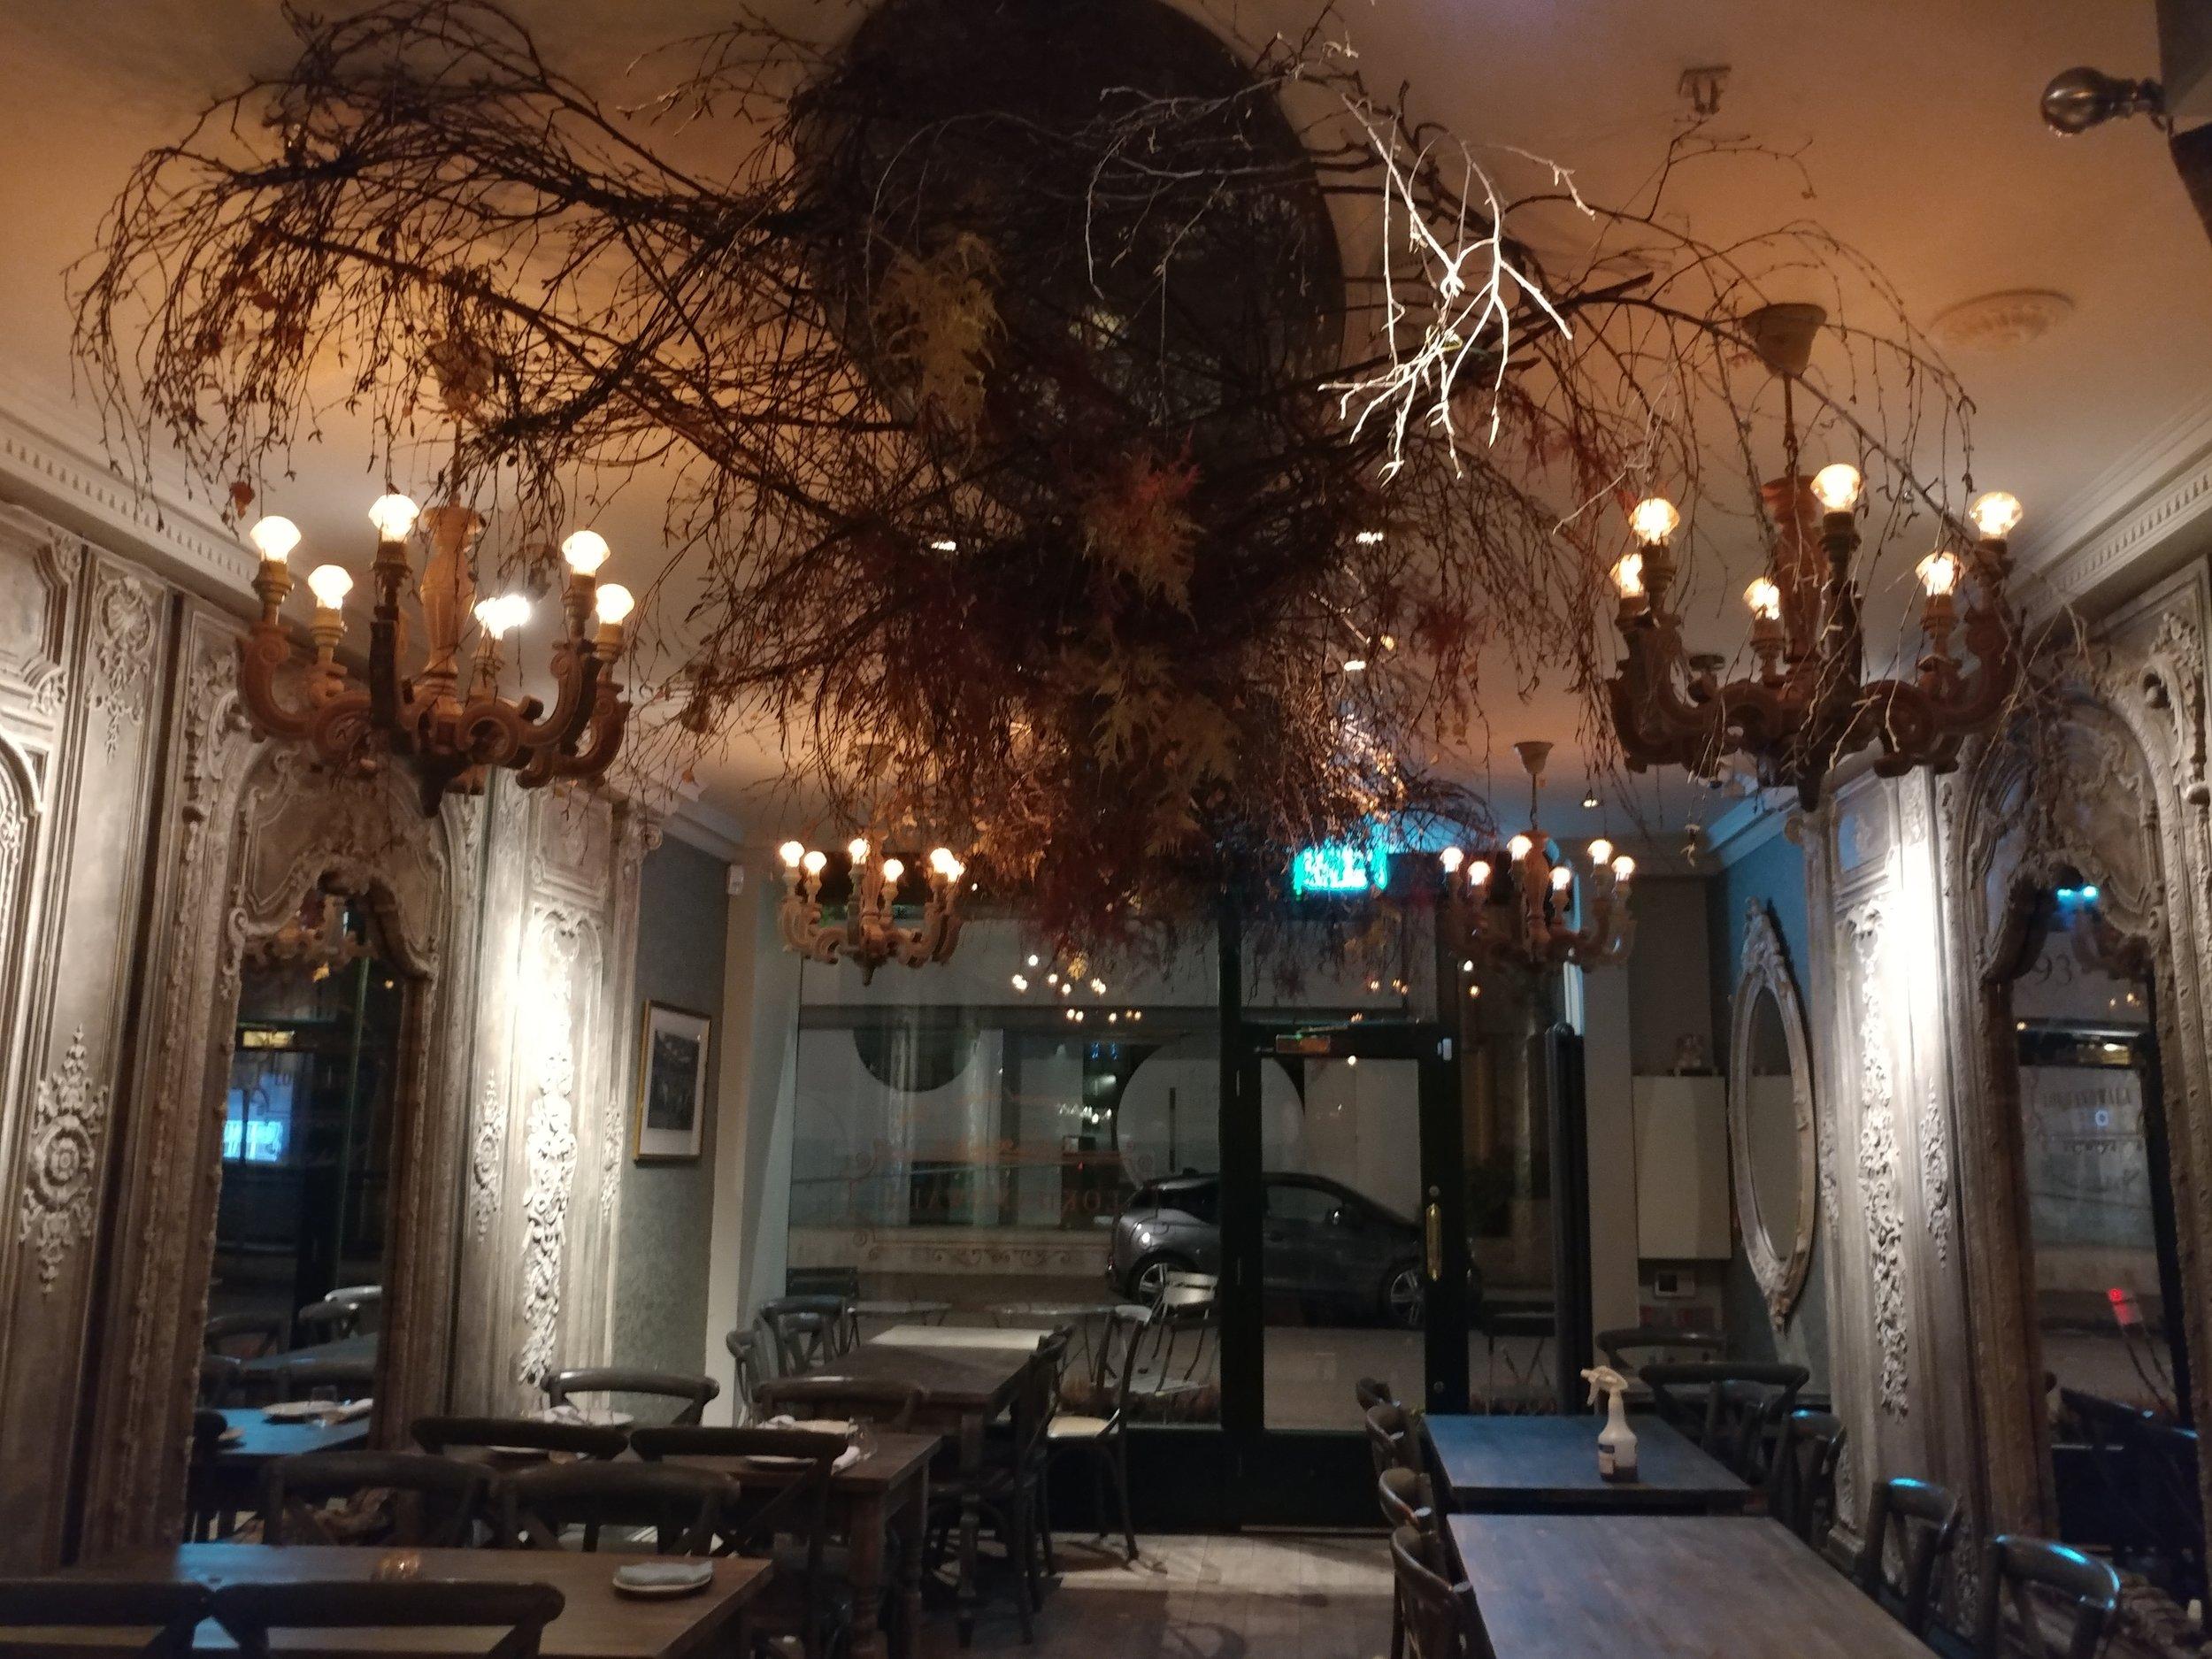 Lokhandwala fitzrovia restaurant design.jpg